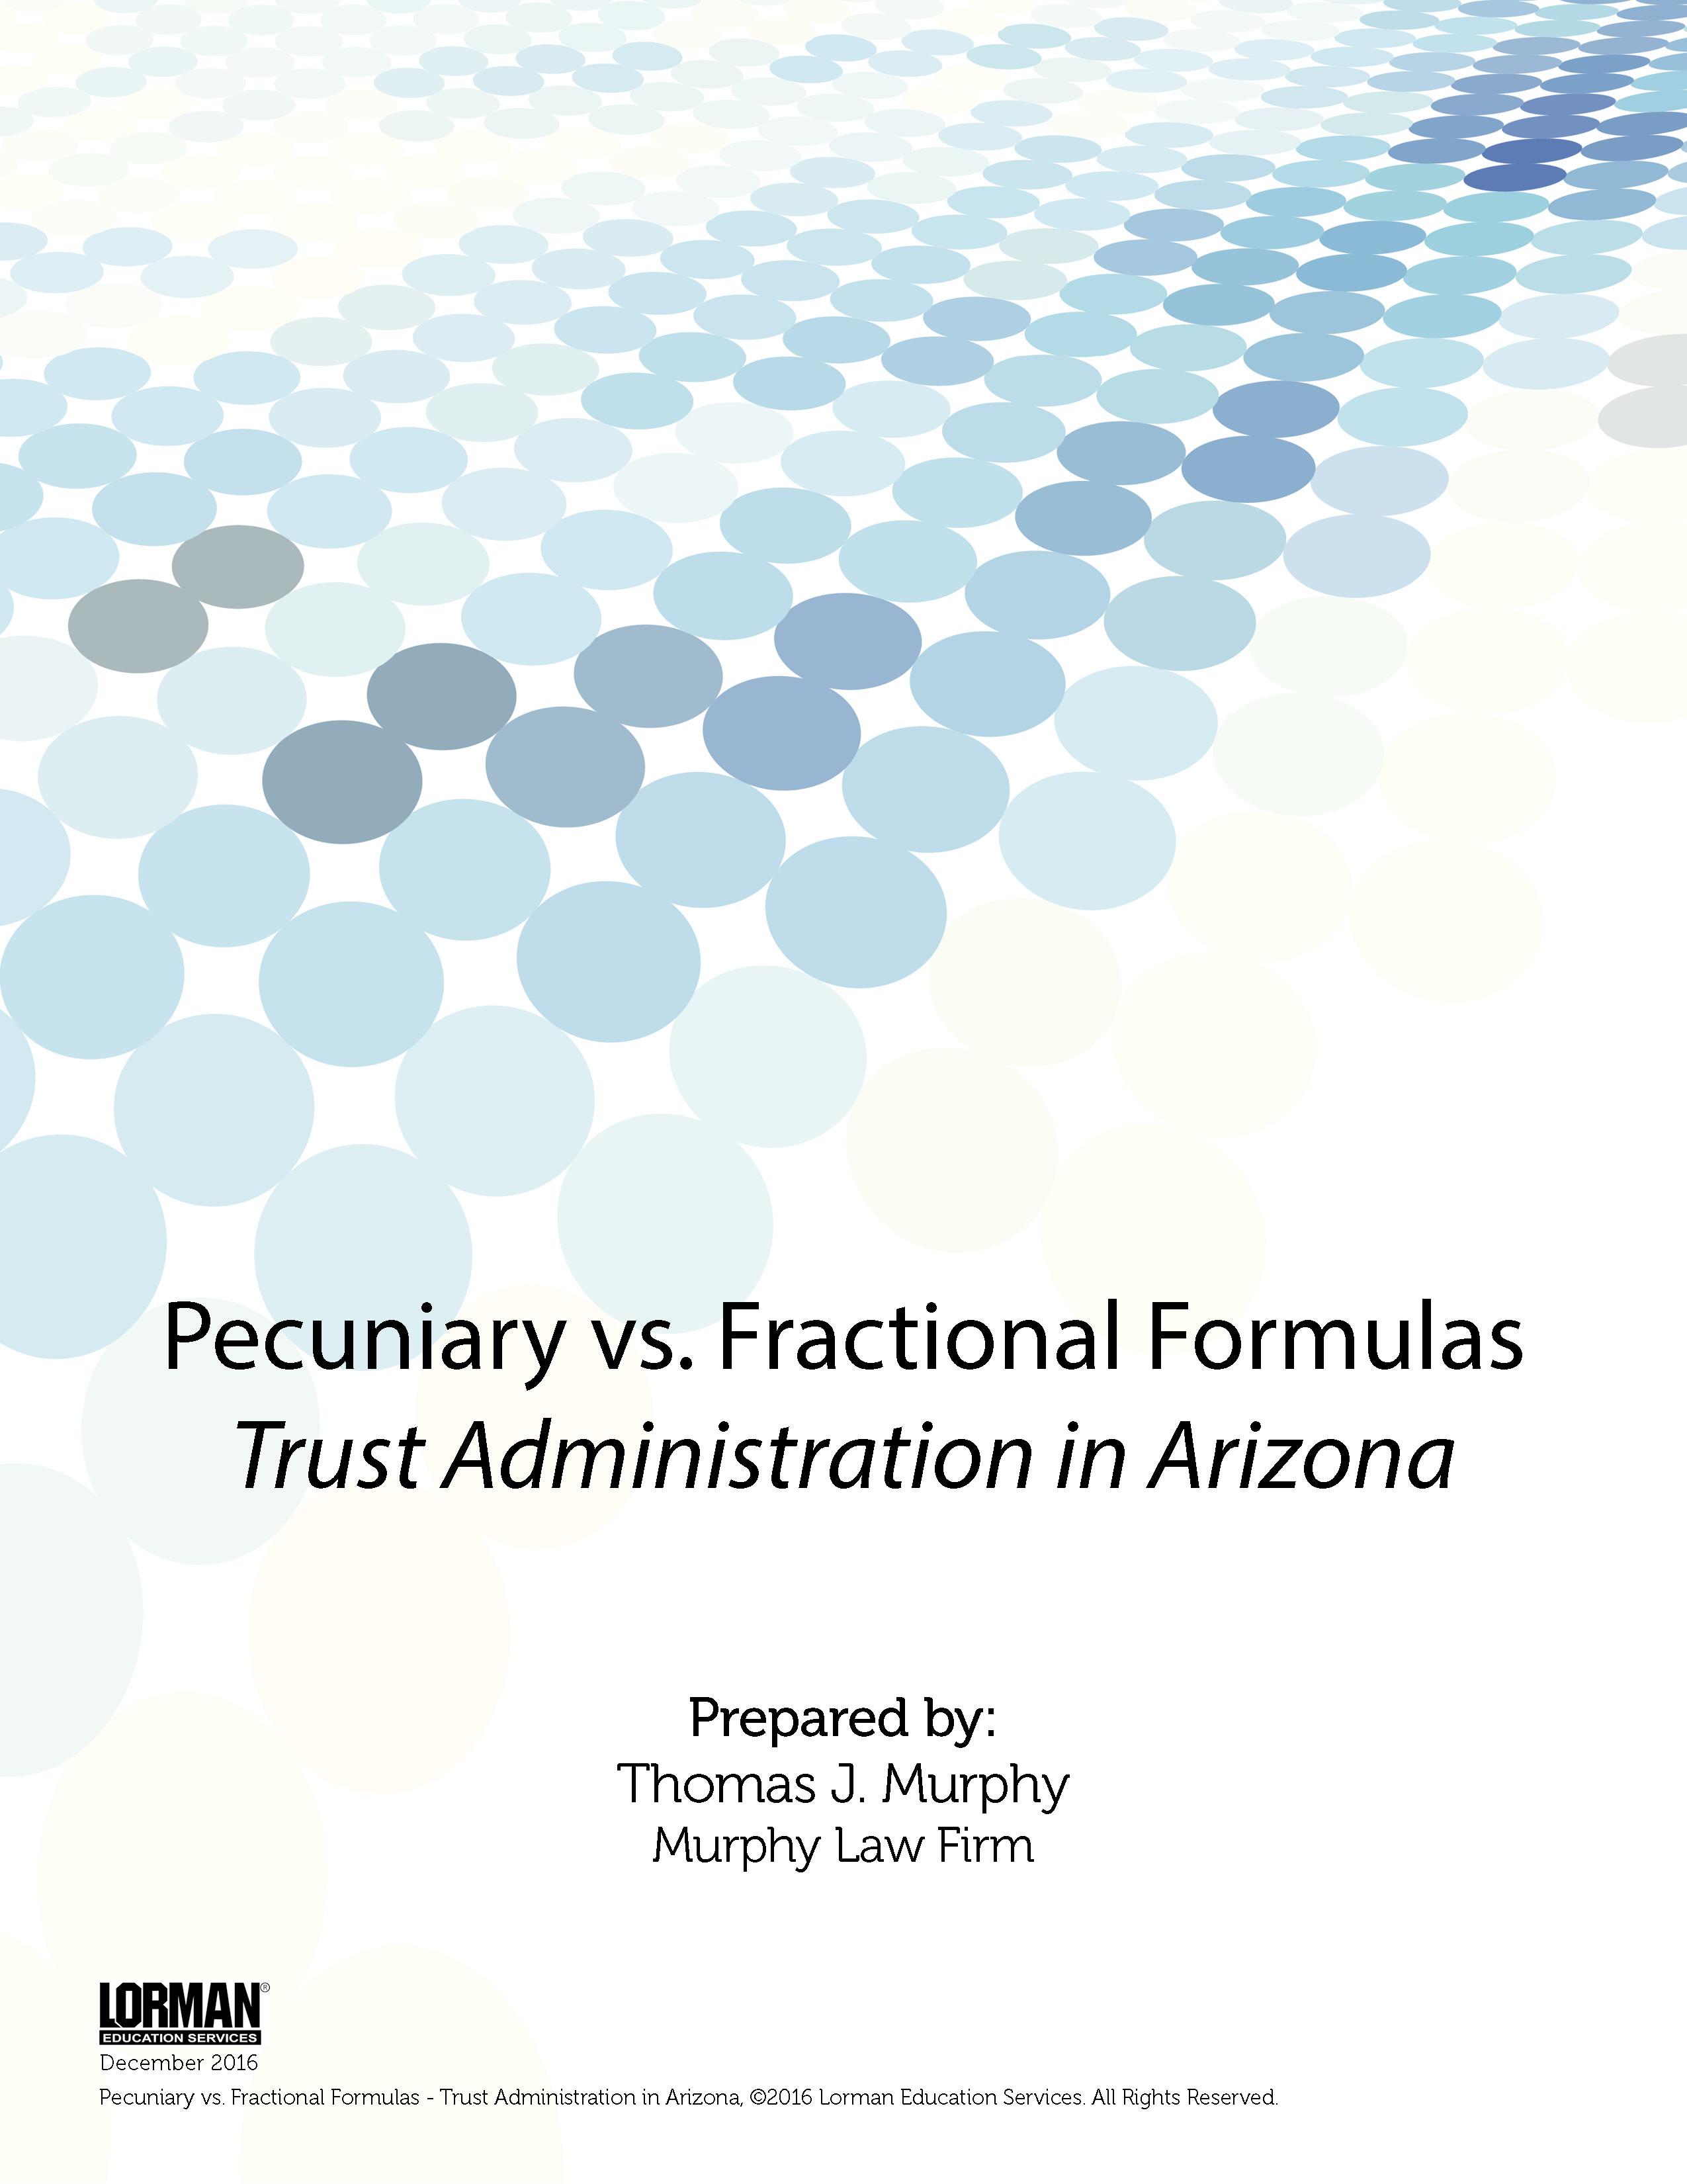 Pecuniary vs. Fractional Formulas - Trust Administration in Arizona ...